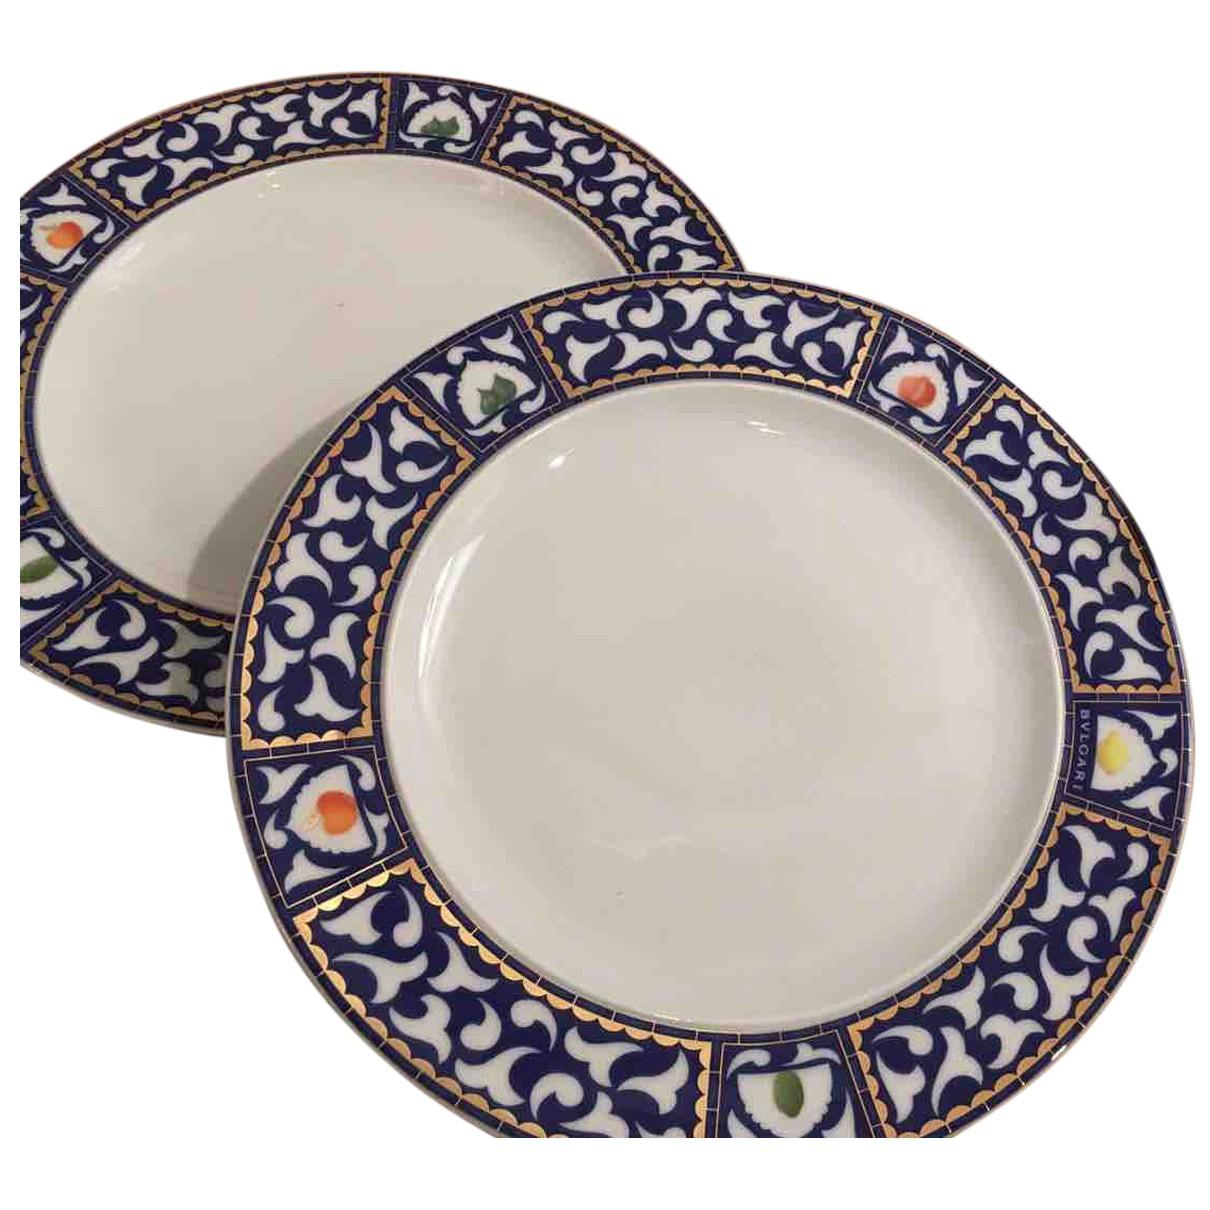 Platos de Porcelana Bvlgari